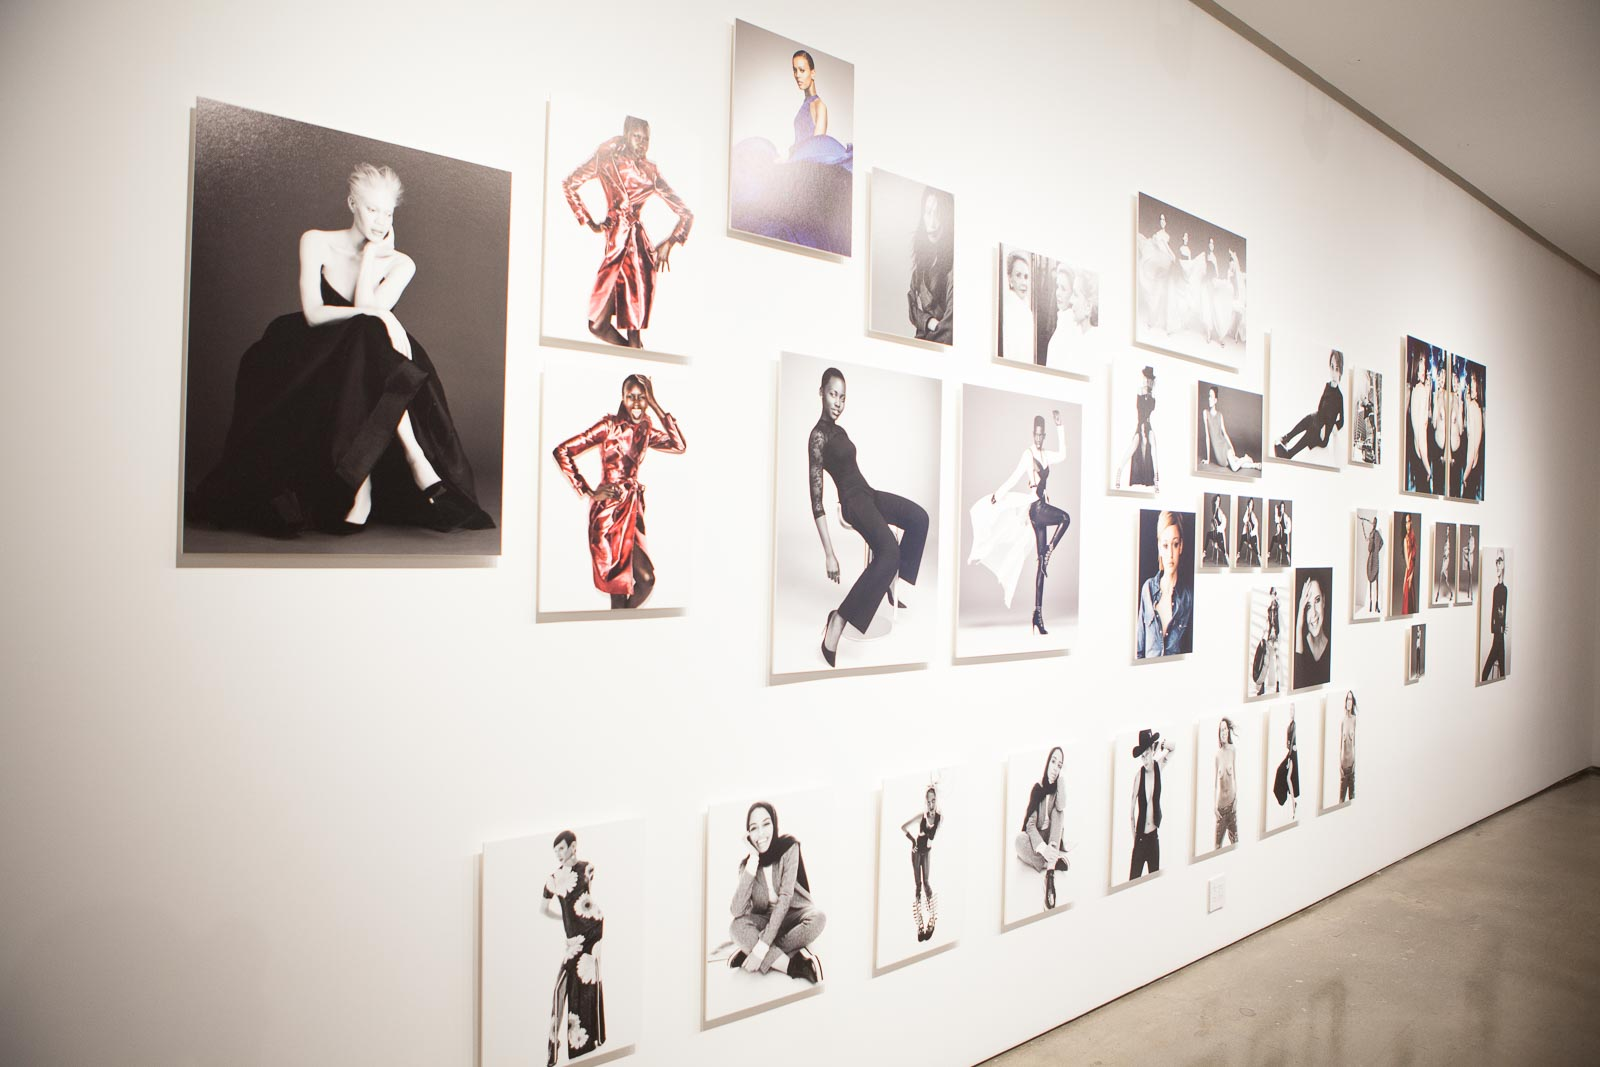 alexi-lubomirski-diverse-beauty-exhibition-robertiaga-14